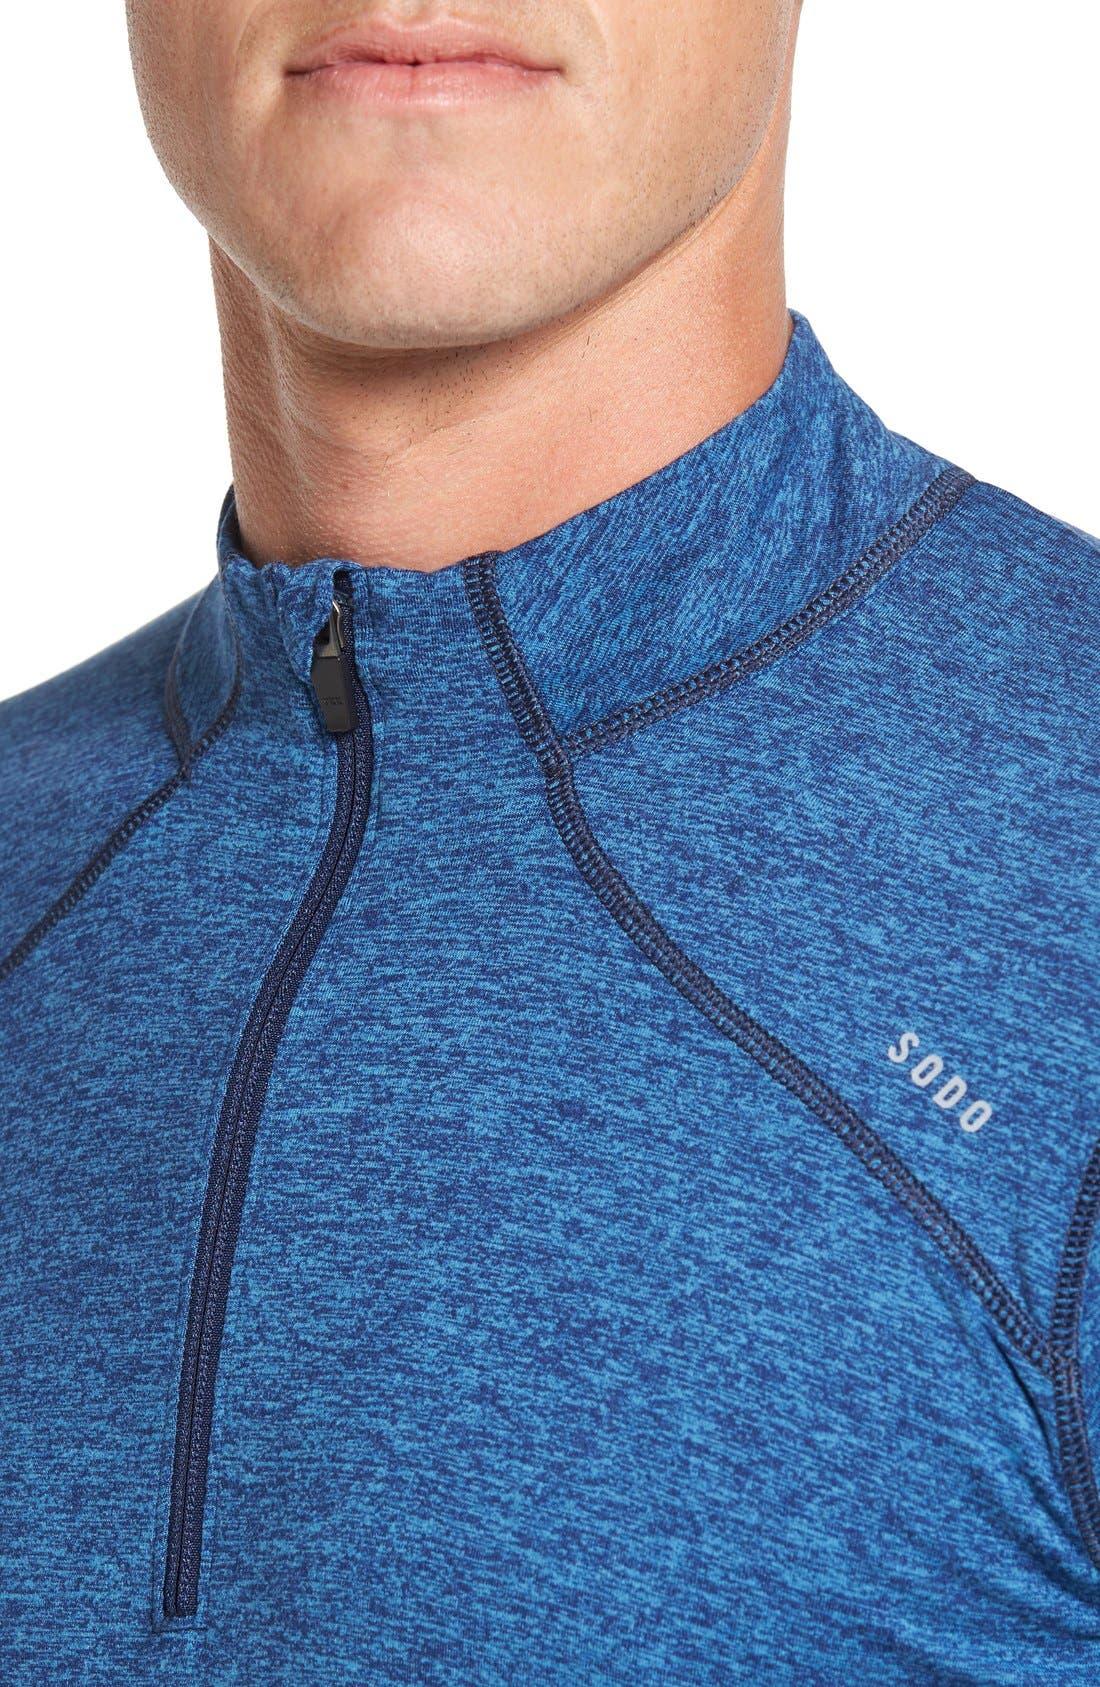 SODO, 'Elevate' Moisture Wicking Stretch Quarter Zip Pullover, Alternate thumbnail 5, color, OCEAN BLUE/ NAVY